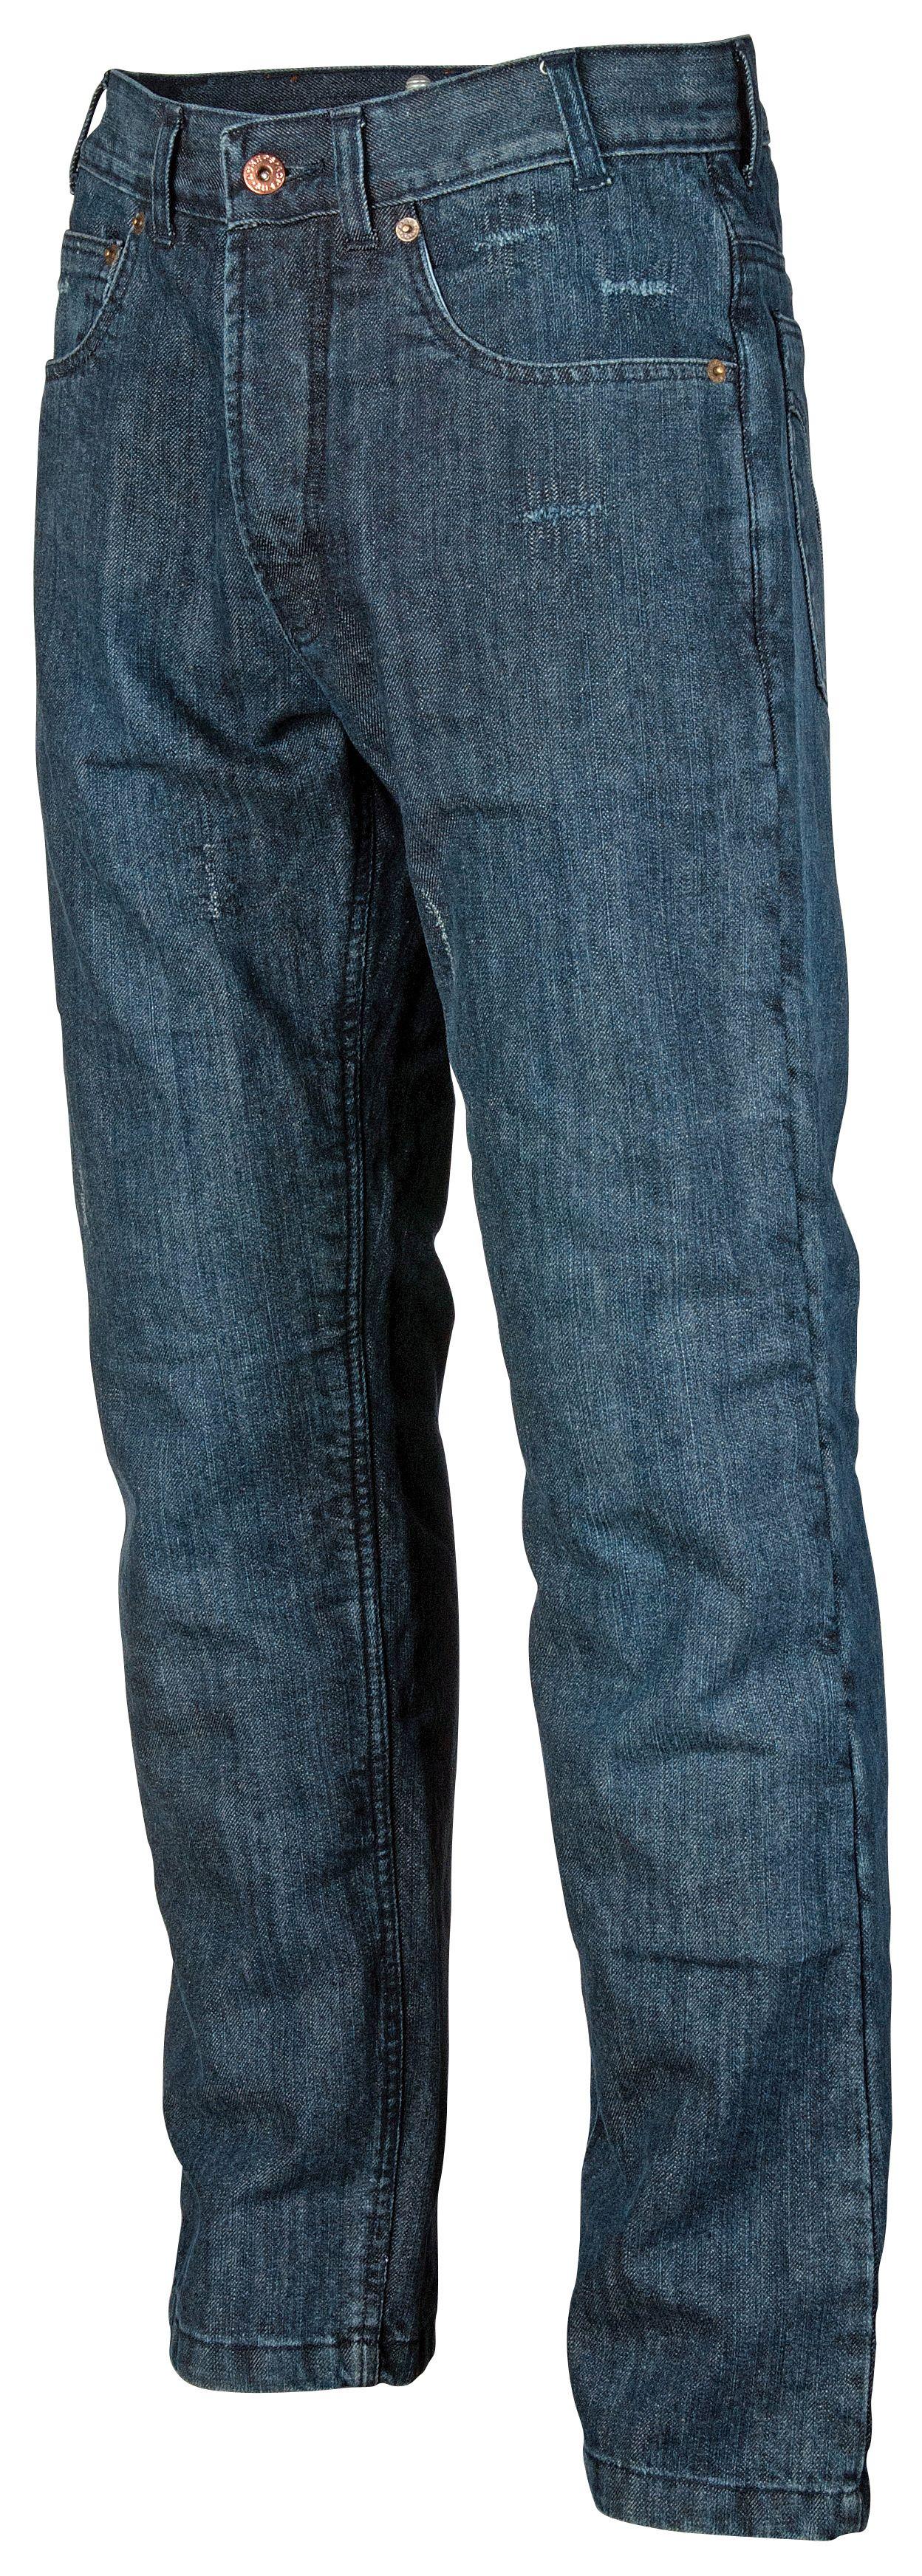 agv sport corsica riding jeans revzilla. Black Bedroom Furniture Sets. Home Design Ideas